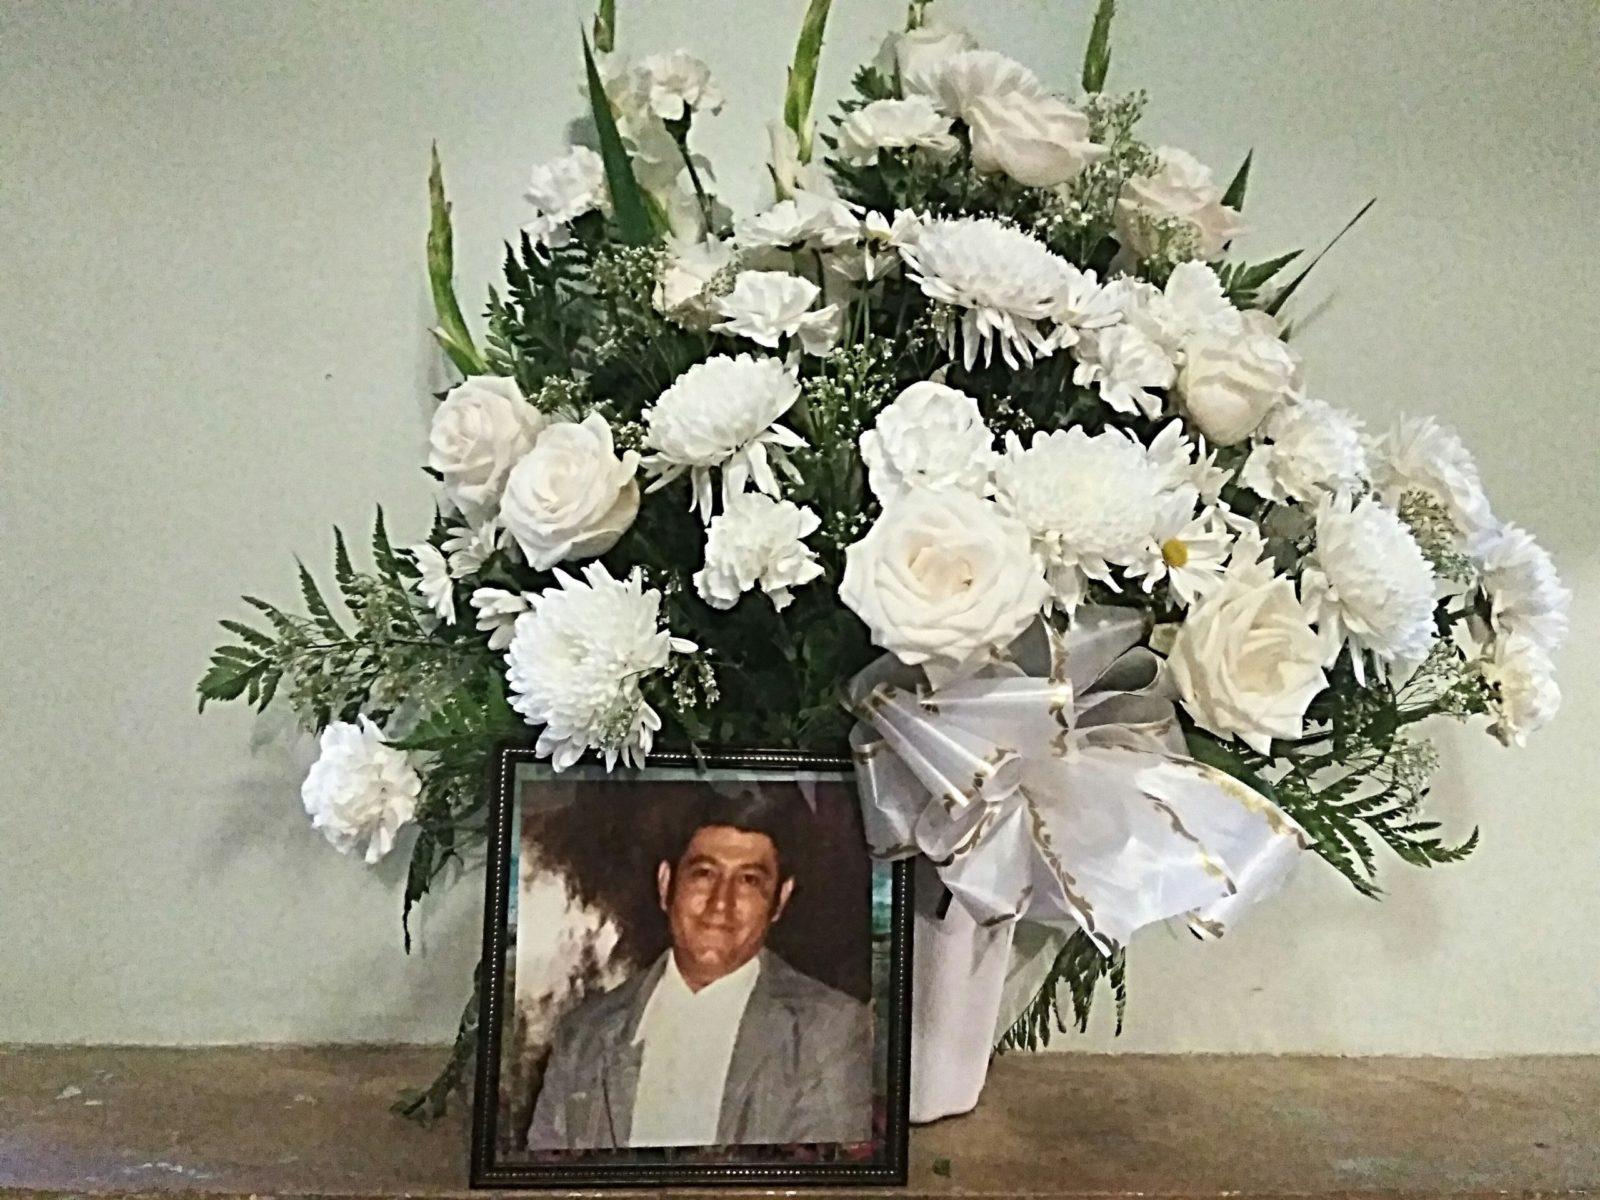 Ricardo-Saldana-Funeral